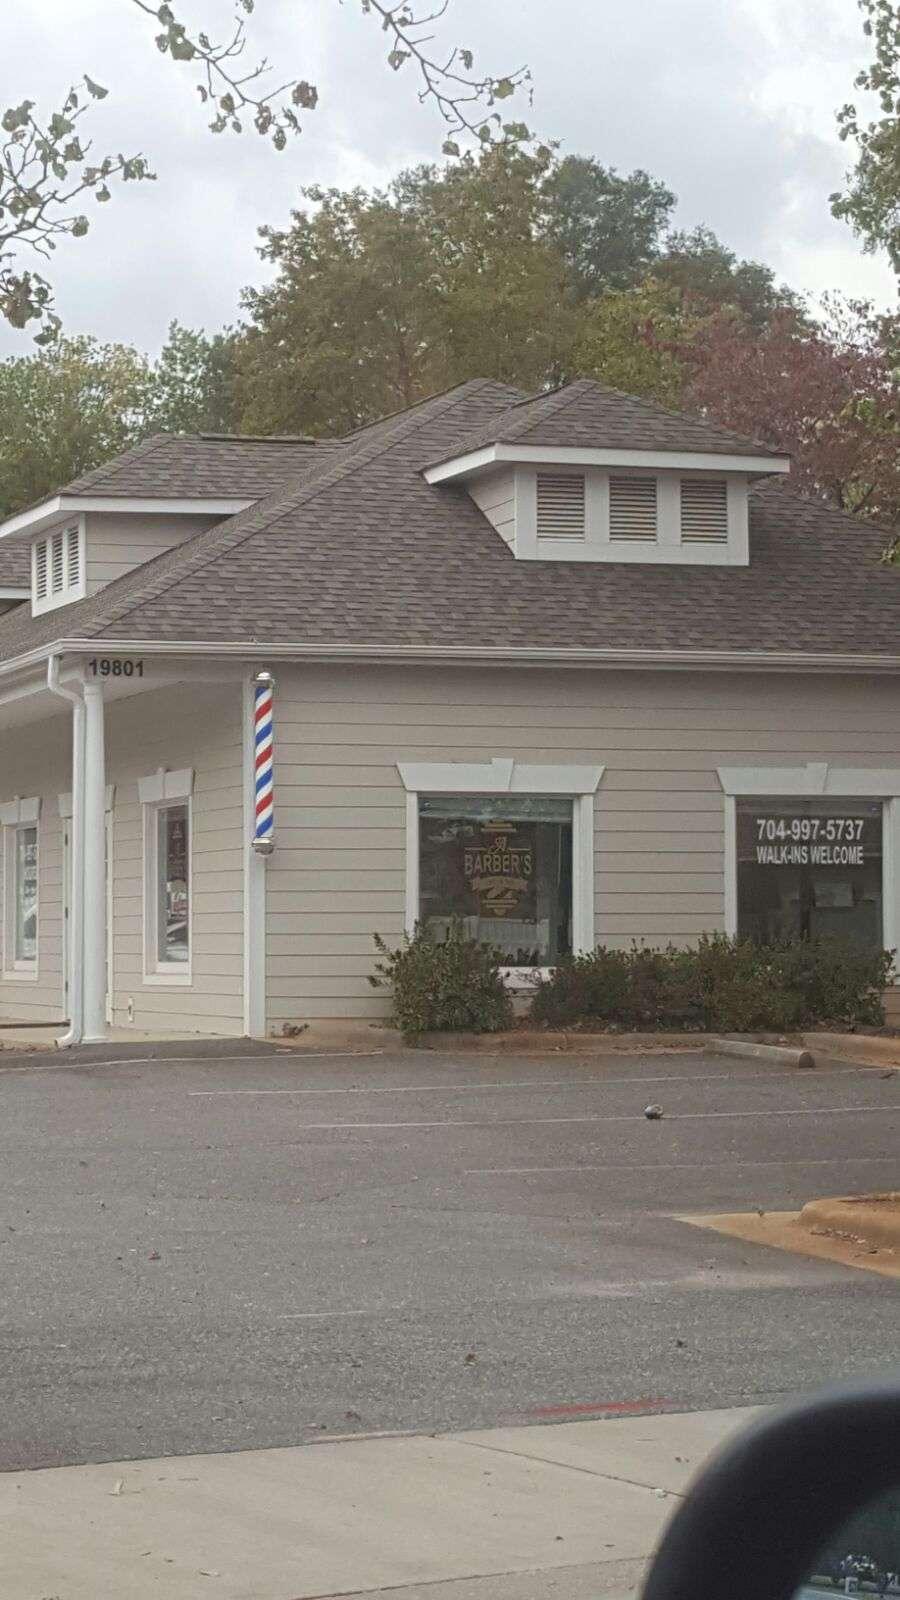 A Barbers Bar & Cafe - hair care    Photo 5 of 10   Address: 19801 S Main St #1, Cornelius, NC 28031, USA   Phone: (704) 997-5737